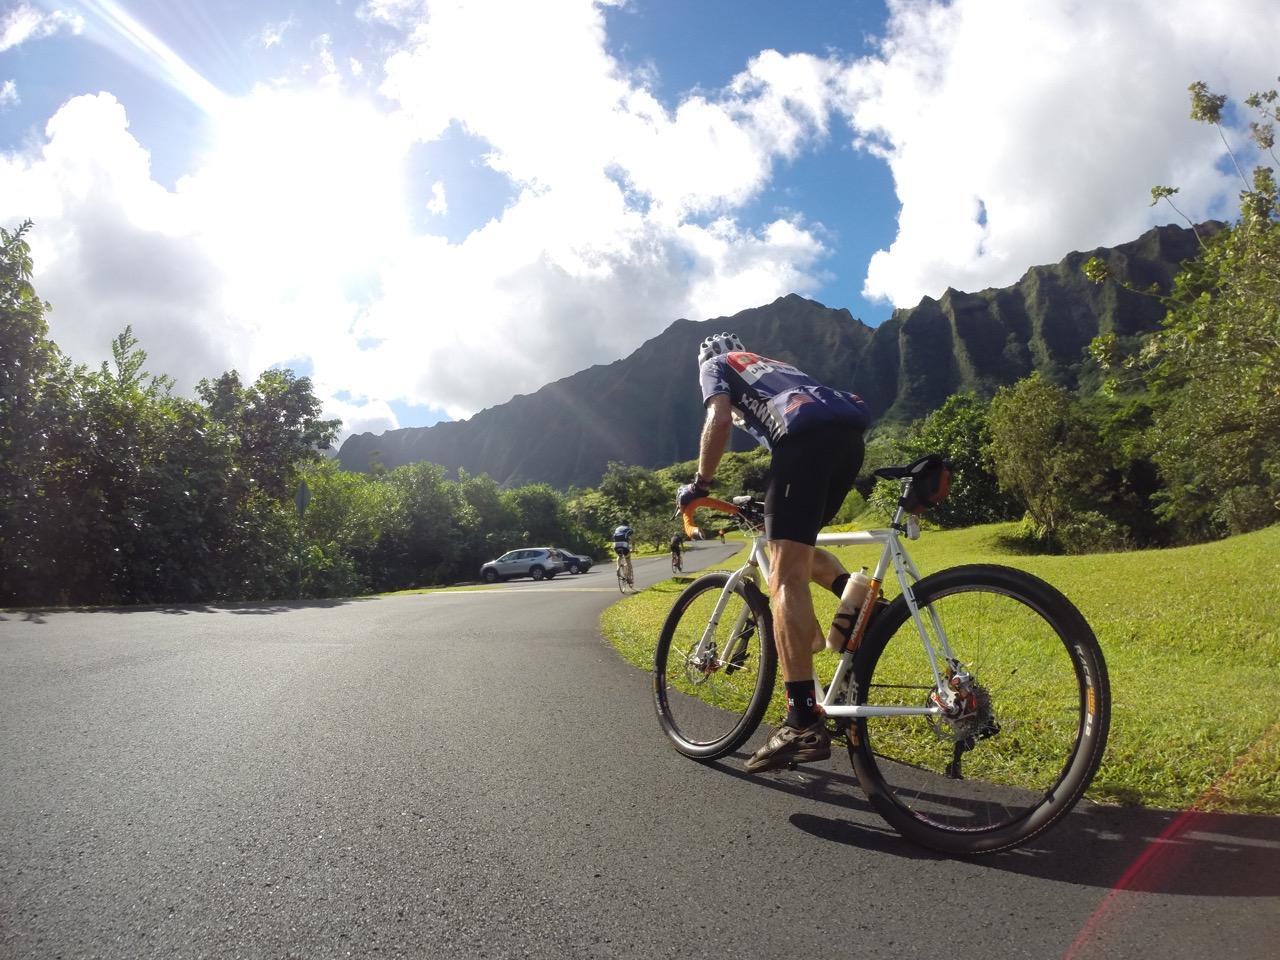 John Girmsey showing us what a real multi-terrain bike looks like.